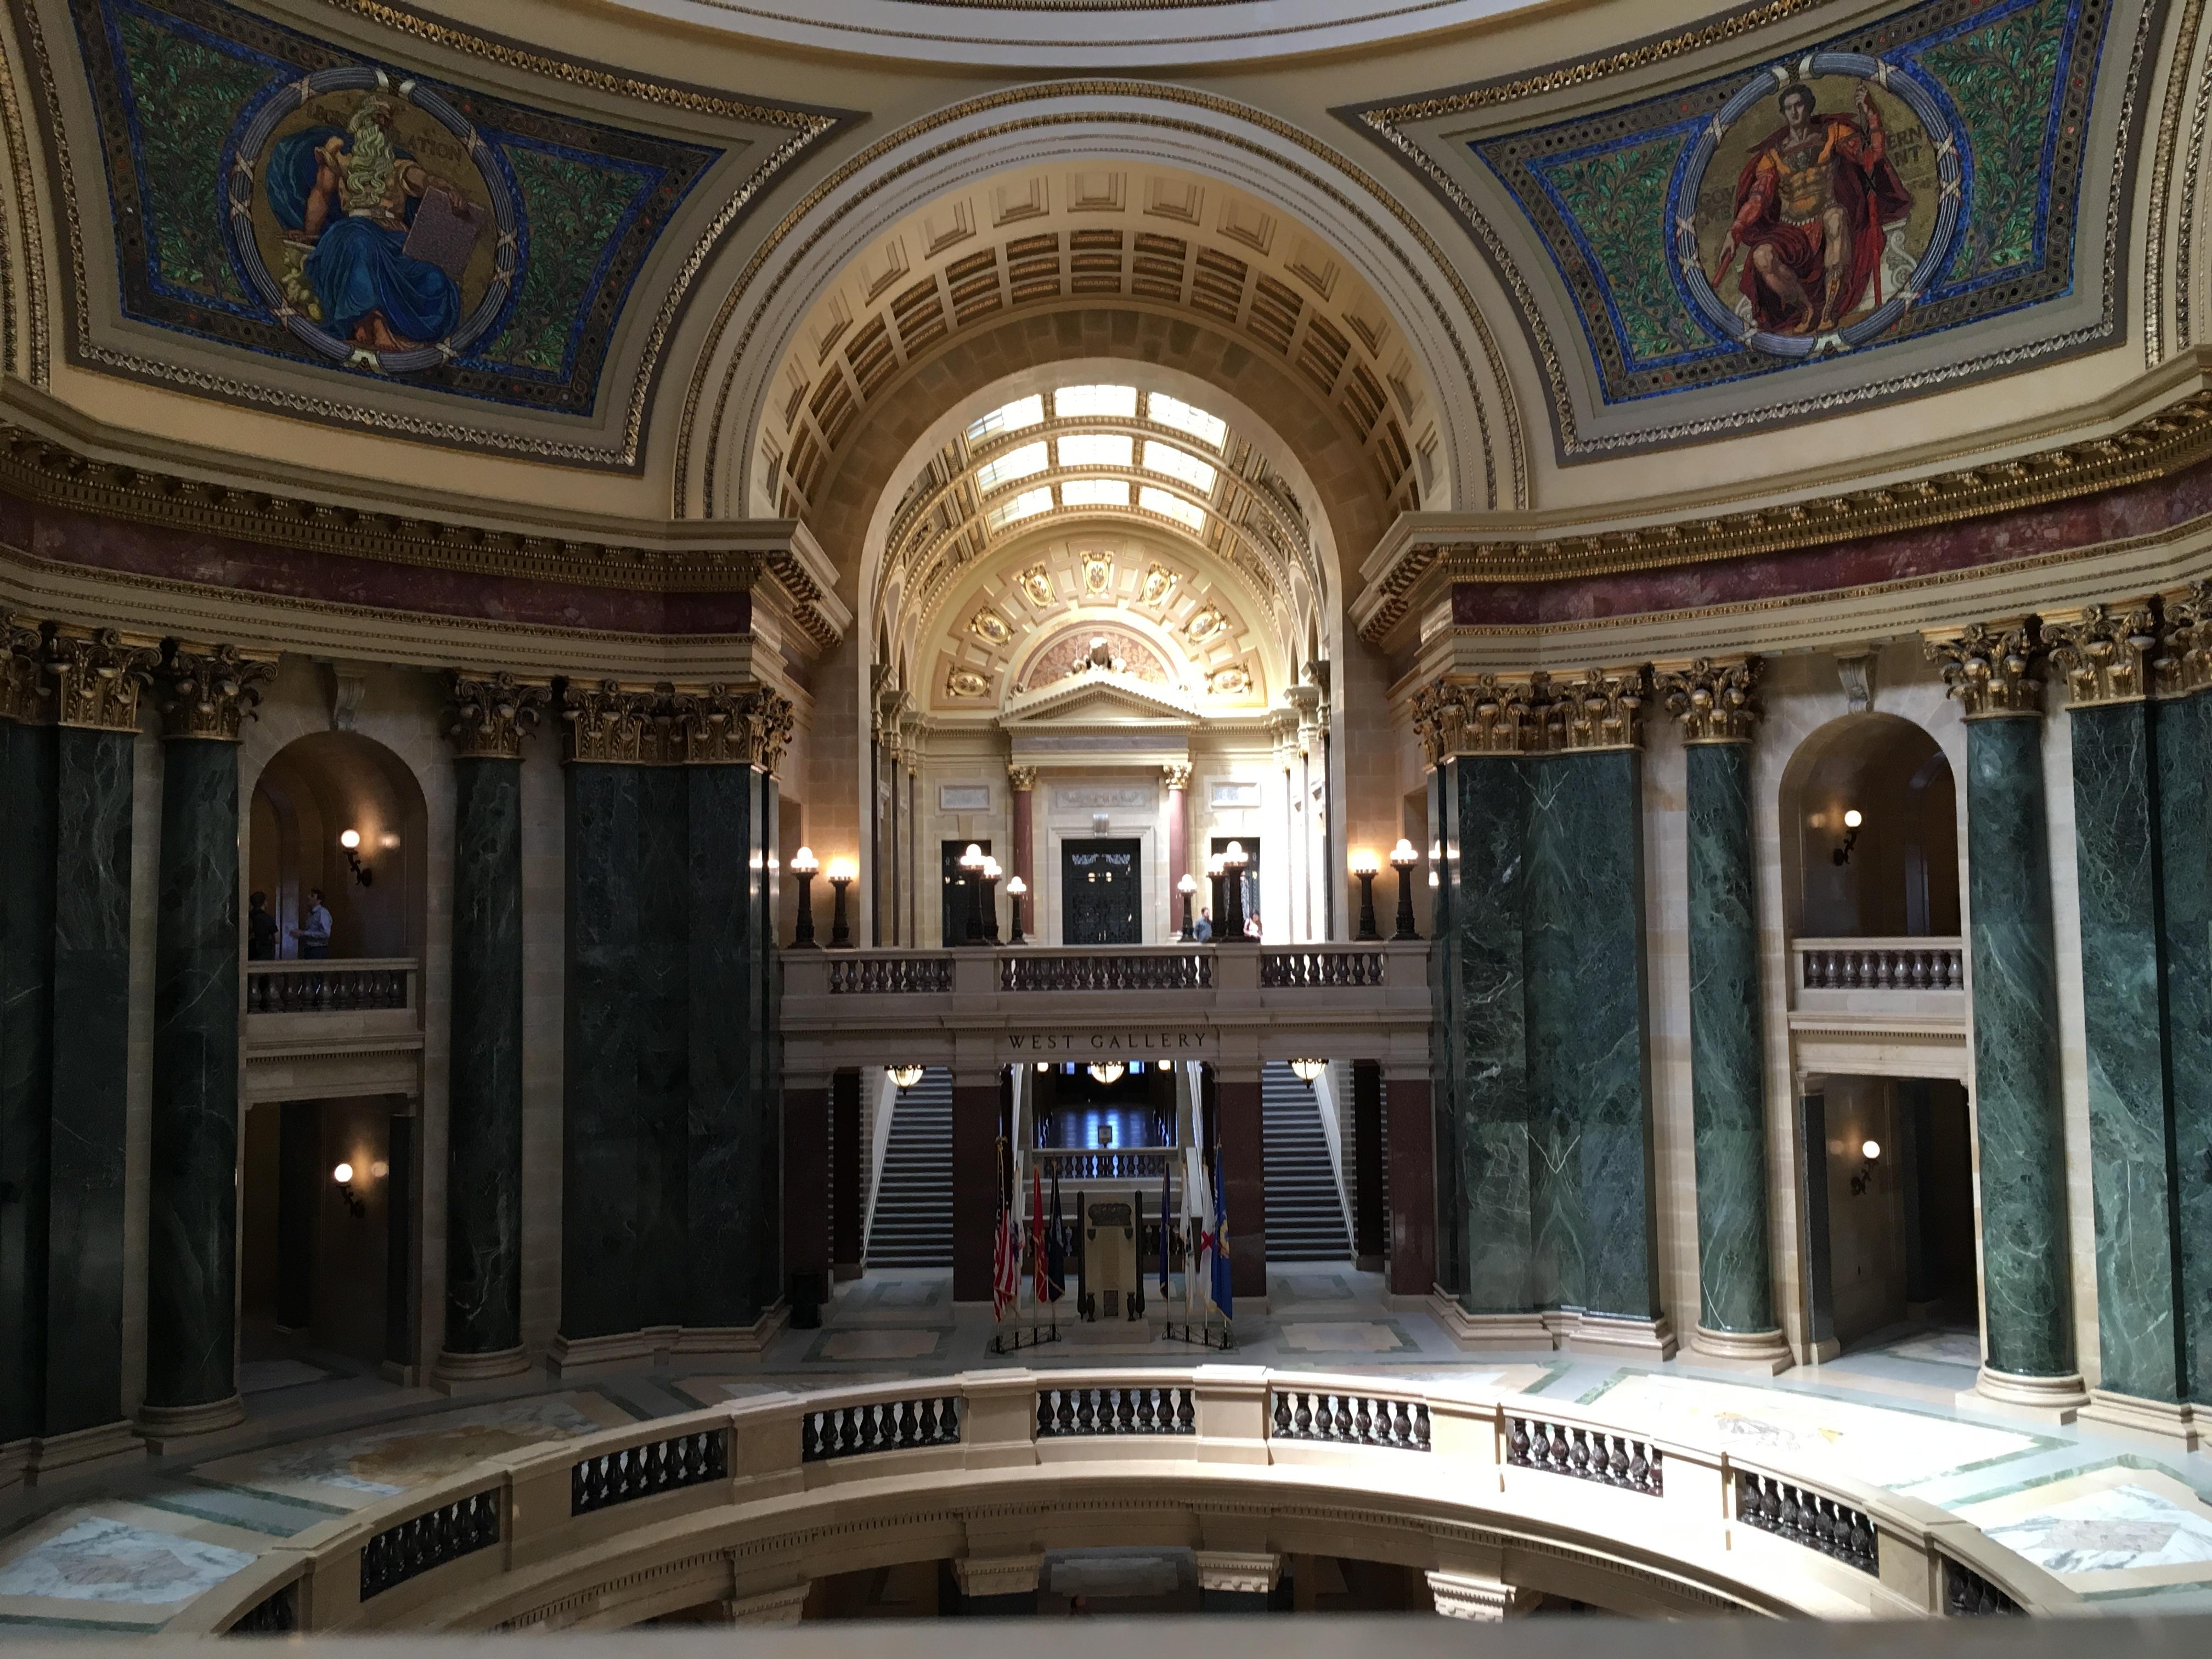 Wisconsin State Capitol. Photo by Mariiana Tzotcheva.